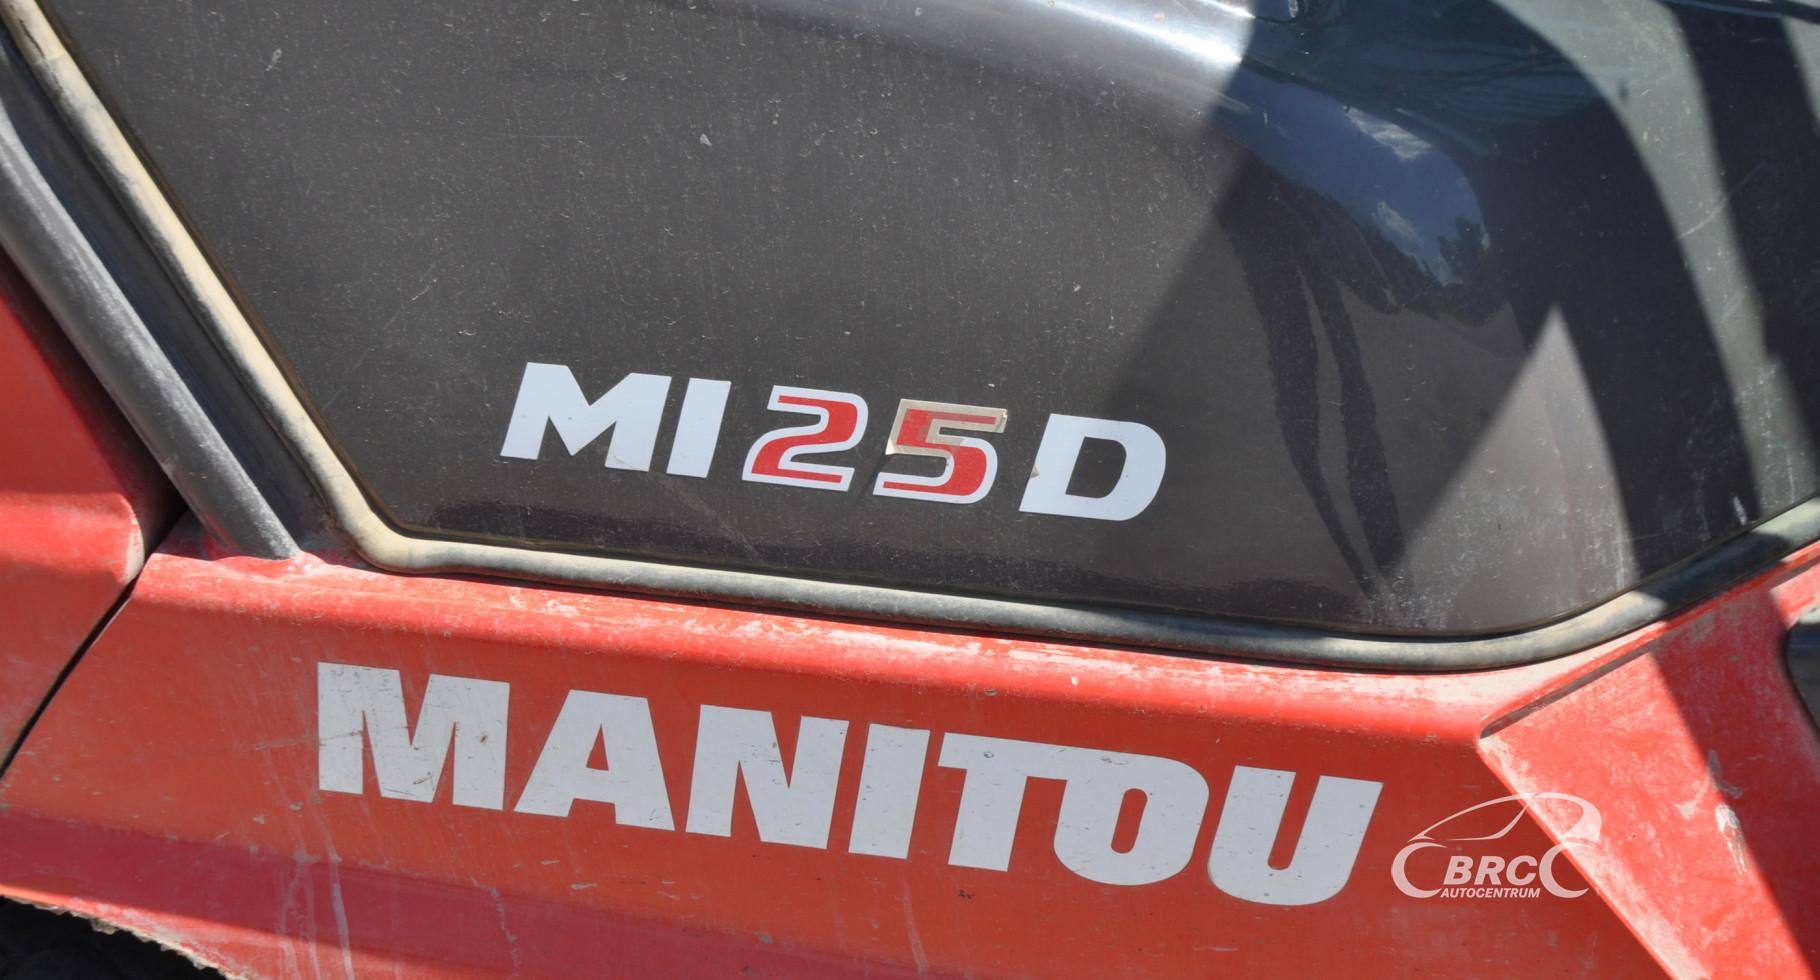 Manitou MI25D